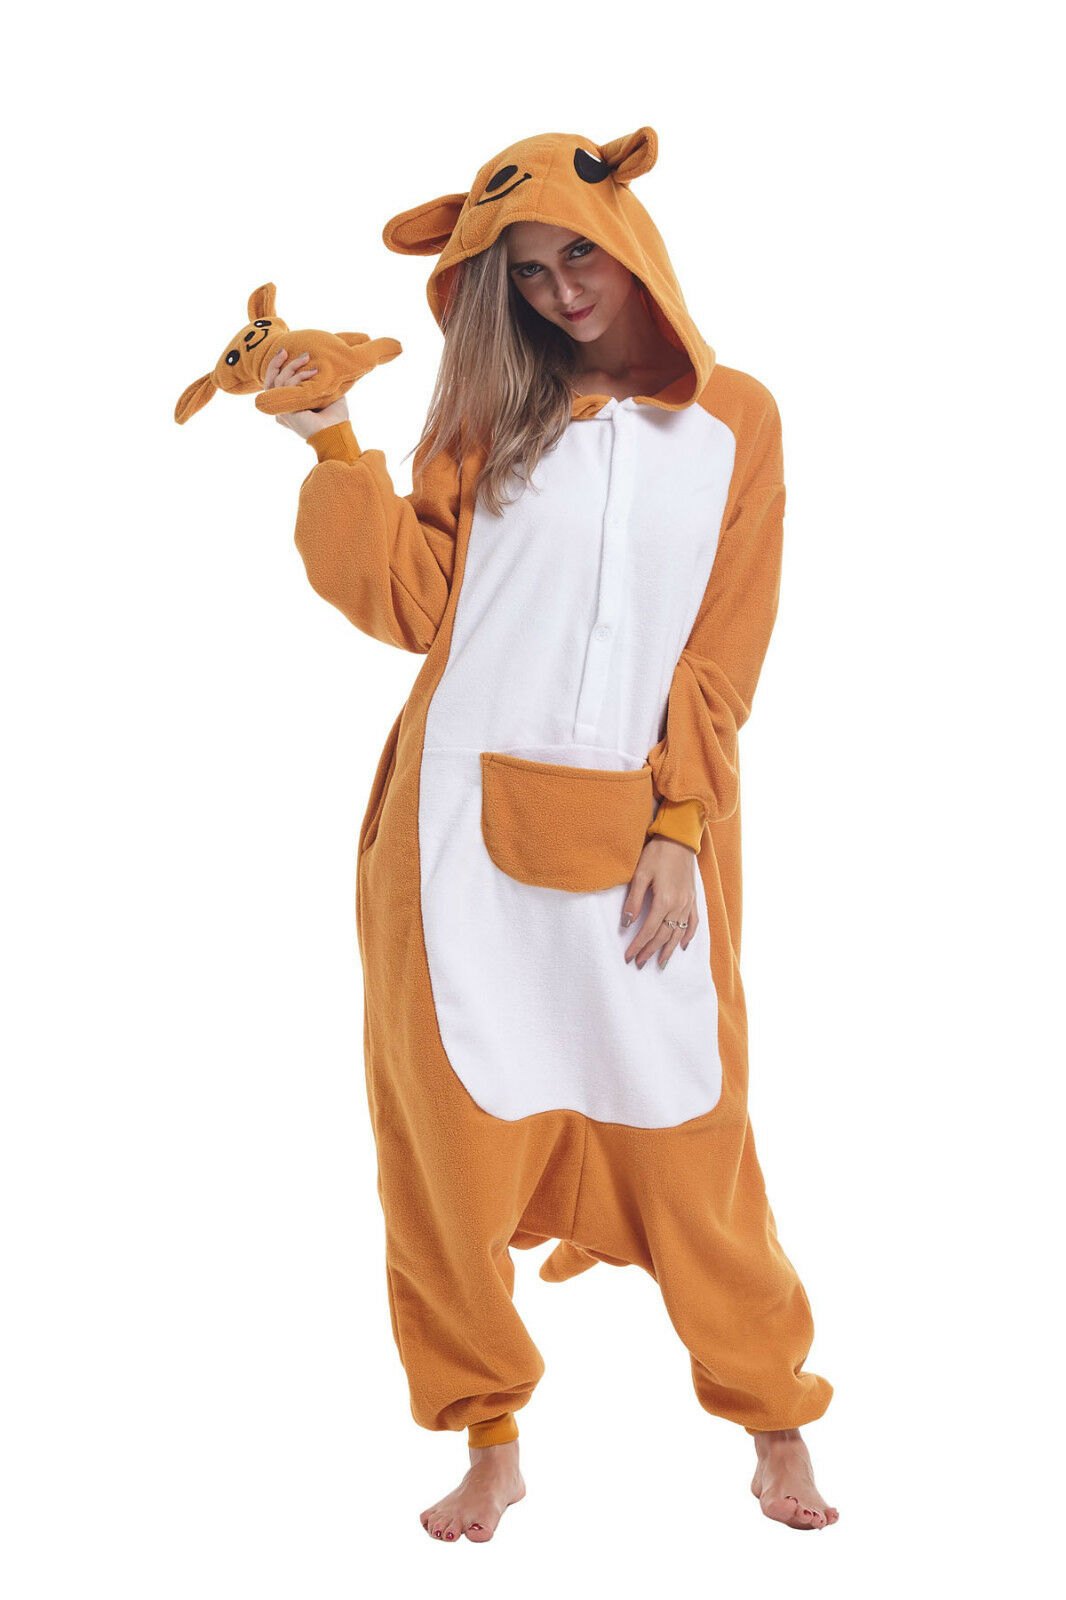 Women Adult Animal Cosplay Costumes Kangaroo Kigurumi Pajama